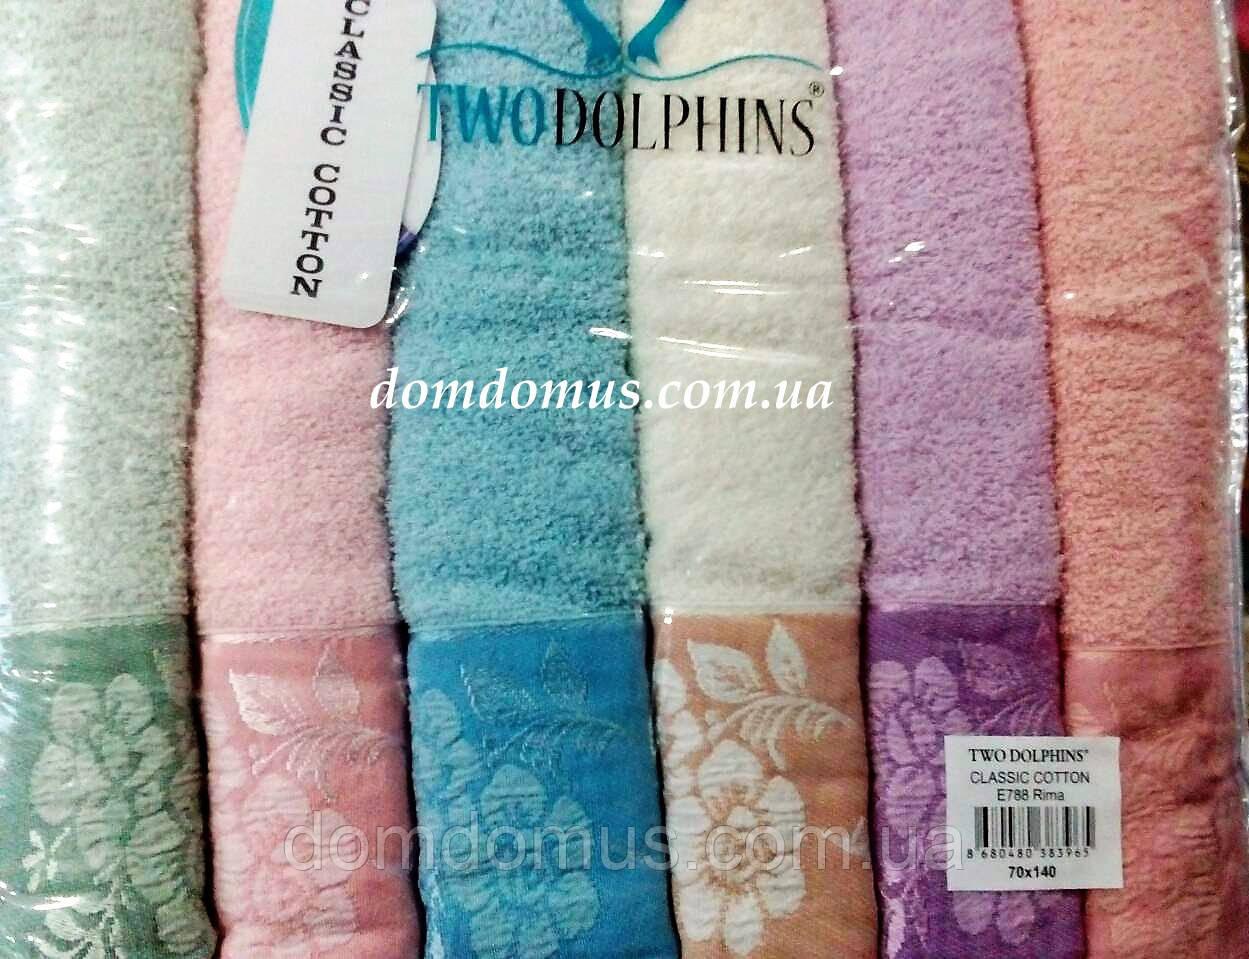 Набір рушників Cotton Rima 50*90 TWO DOLPHINS 6 шт./уп., Туреччина 788